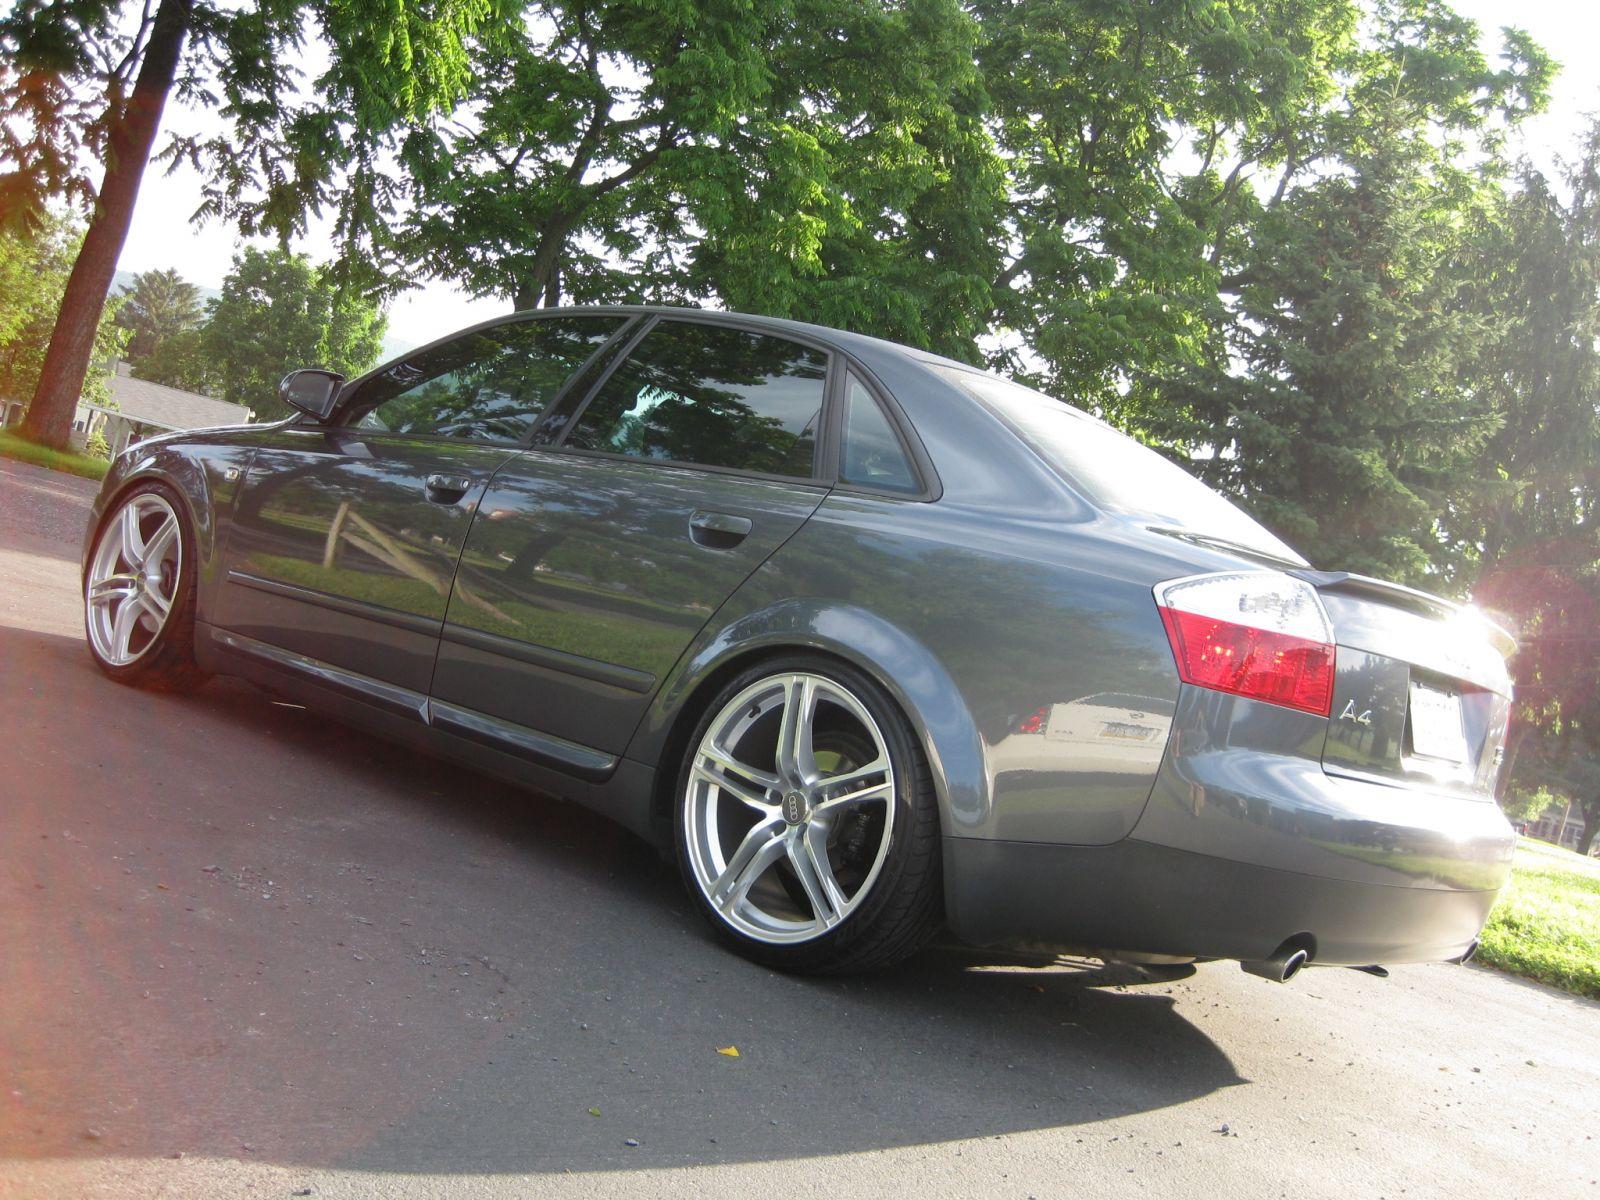 2003 Audi A4 1 8t 5 Spd Quattro Best Offer Takes It 14500